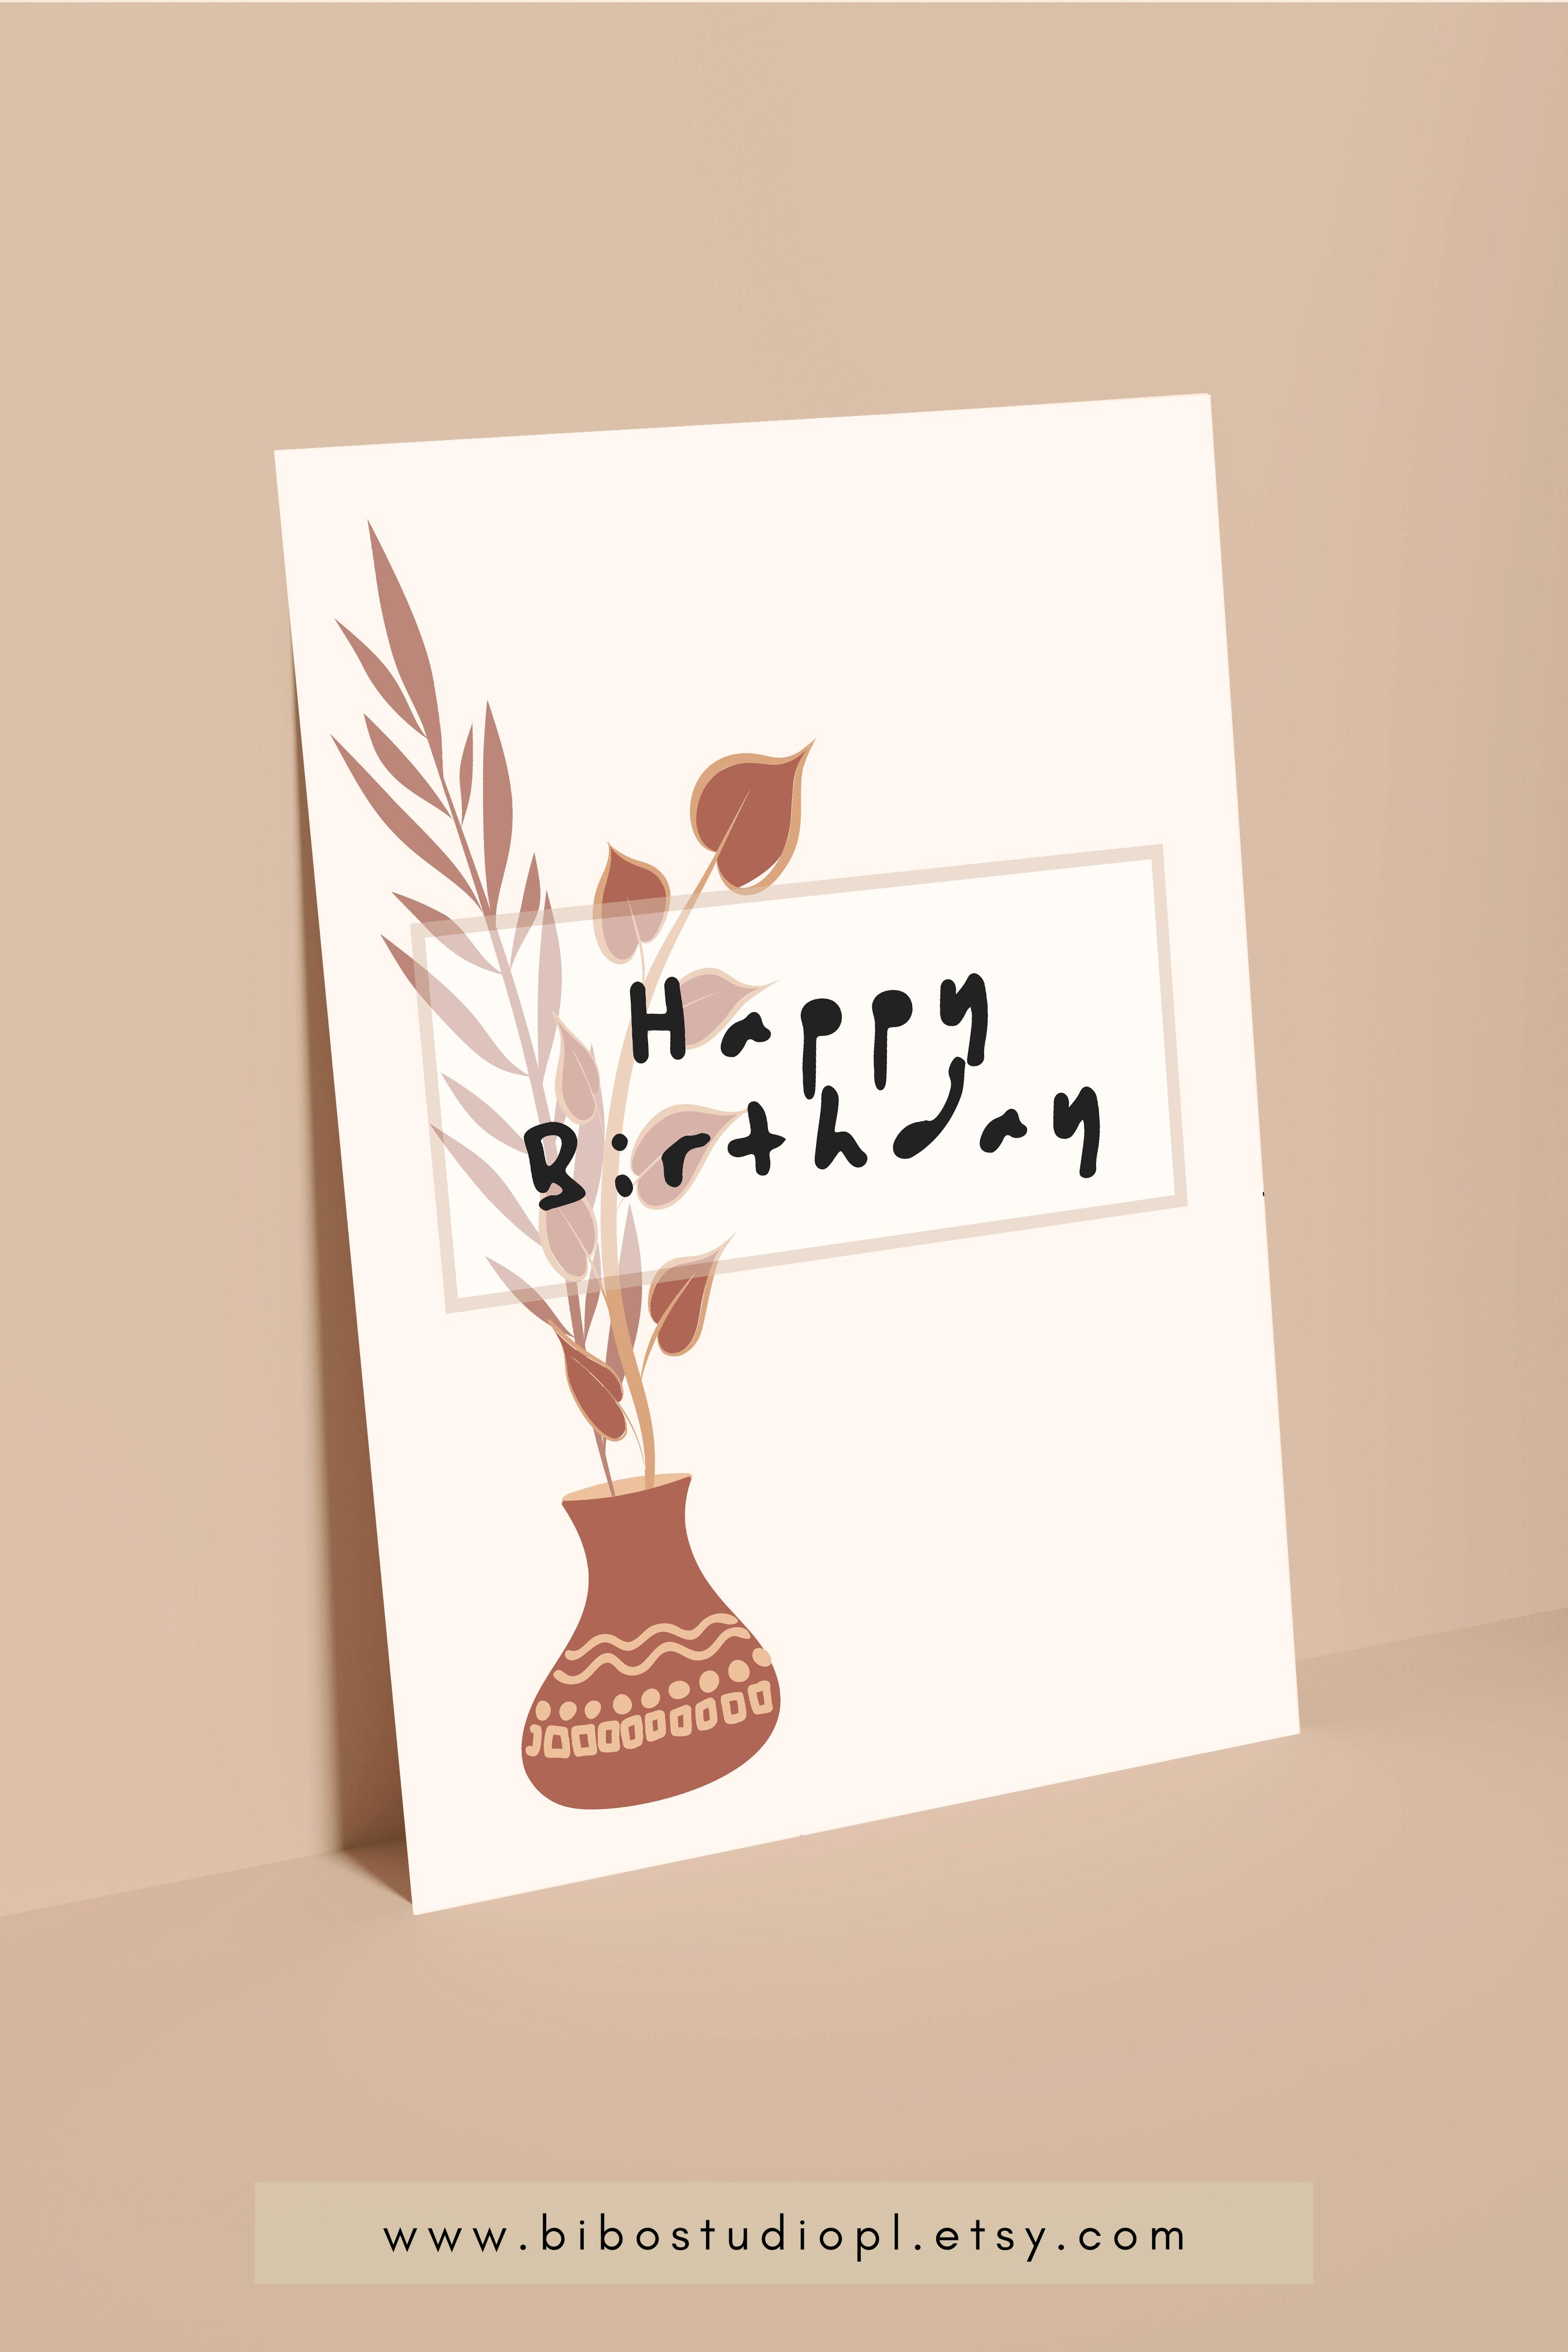 Printable Happy Birthday Card Modern Birthday Wishes Instant Download Card Happy Birthday Cards Printable Birthday Cards Birthday Cards For Her